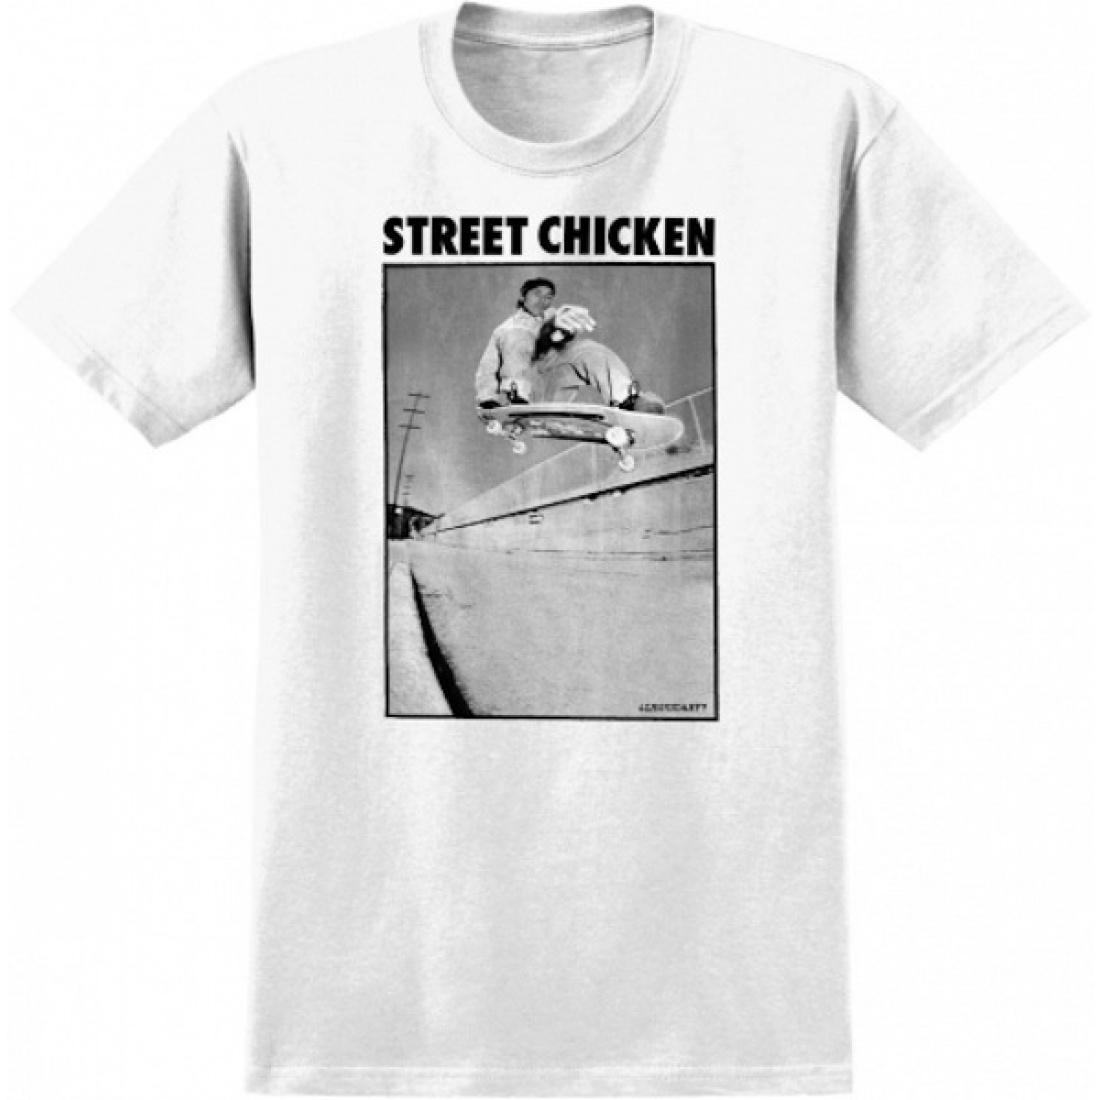 RL-TG Street Chicken White Tee